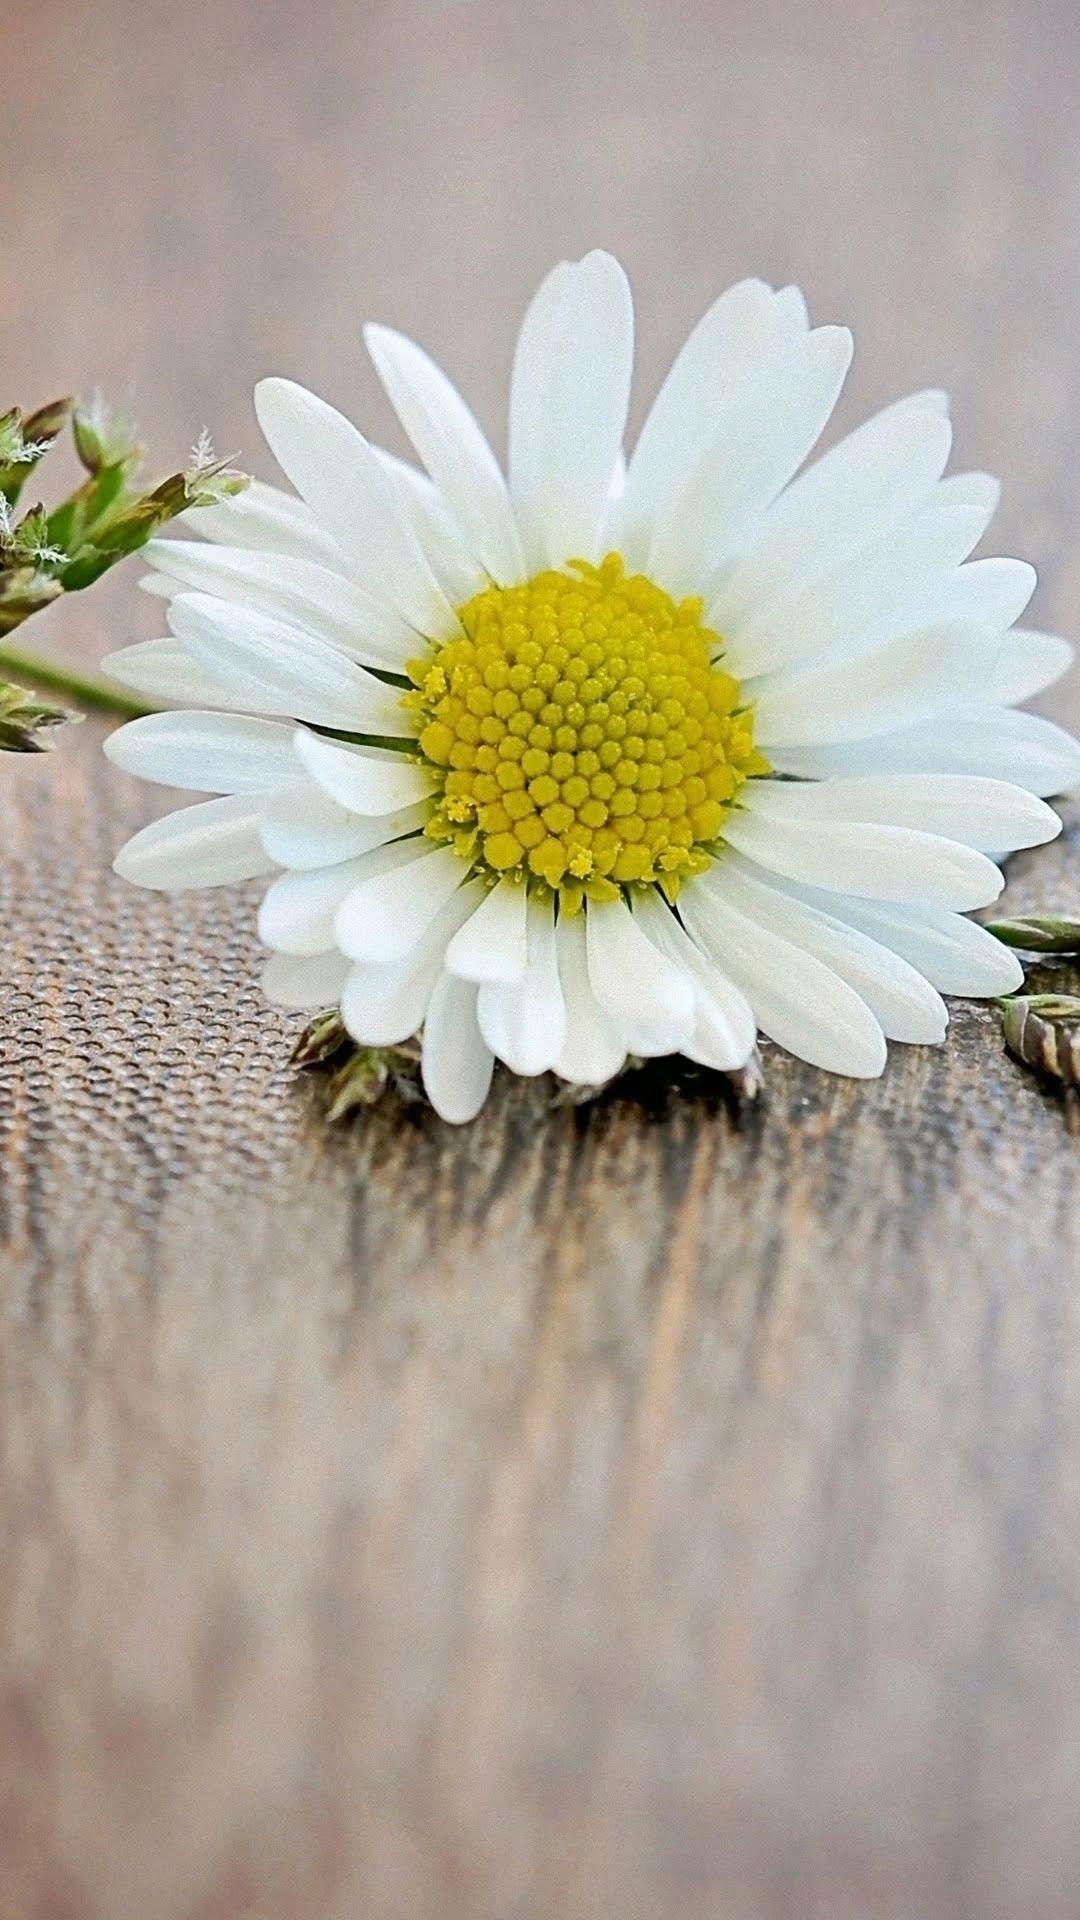 Pin By Mongkol Sangpandee On A G Pinterest Flowers